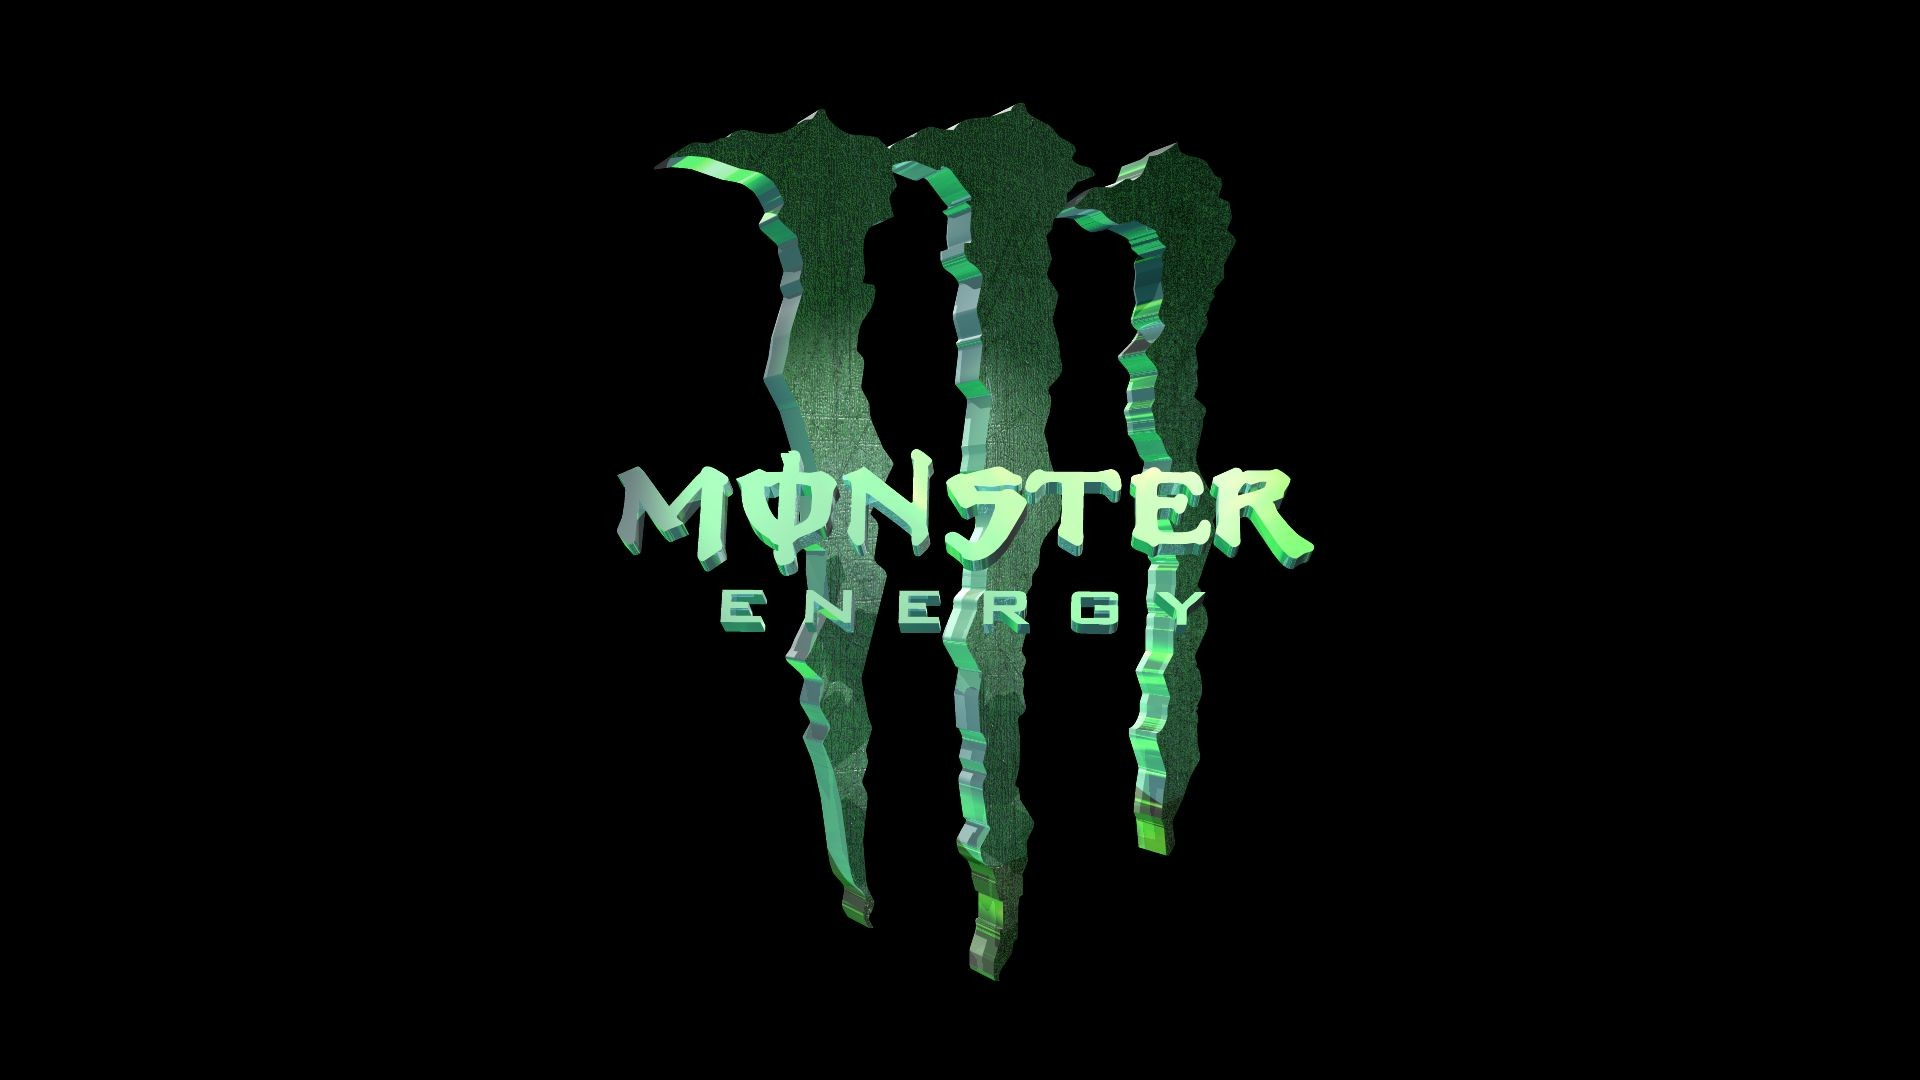 3D Monster Desktop Wallpaper, 3D Monster Pictures, New Wallpapers